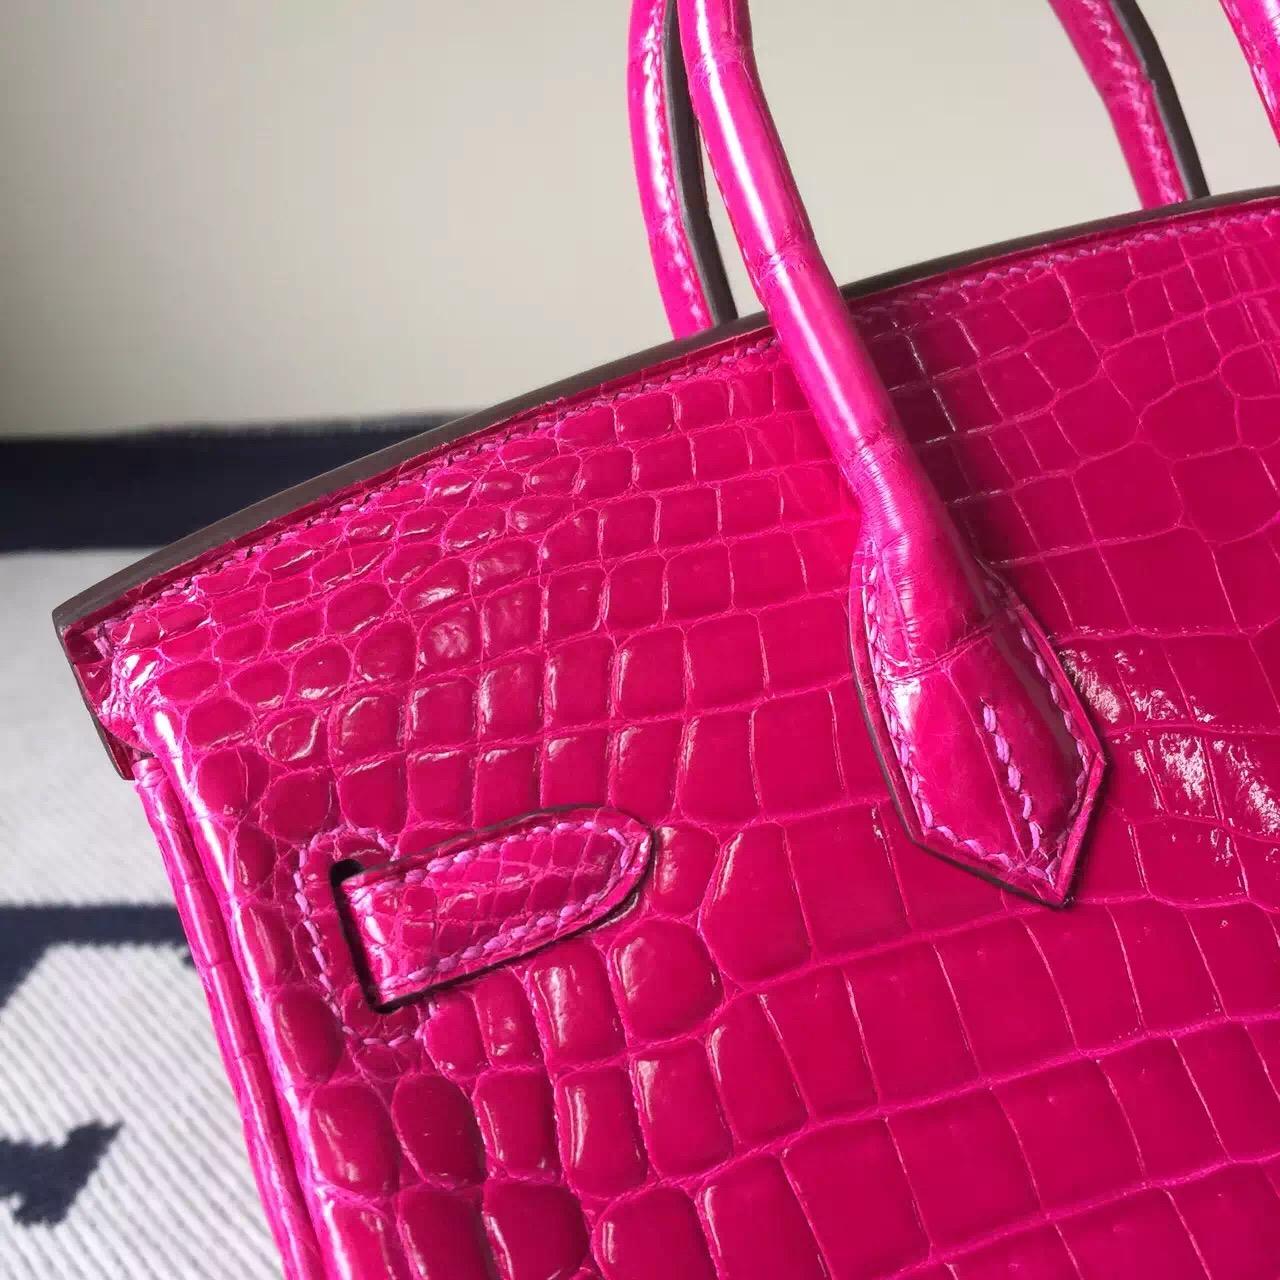 Cheap Hermes Crocodile Shiny Leather Birkin25cm in J5 Rose Scheherazade